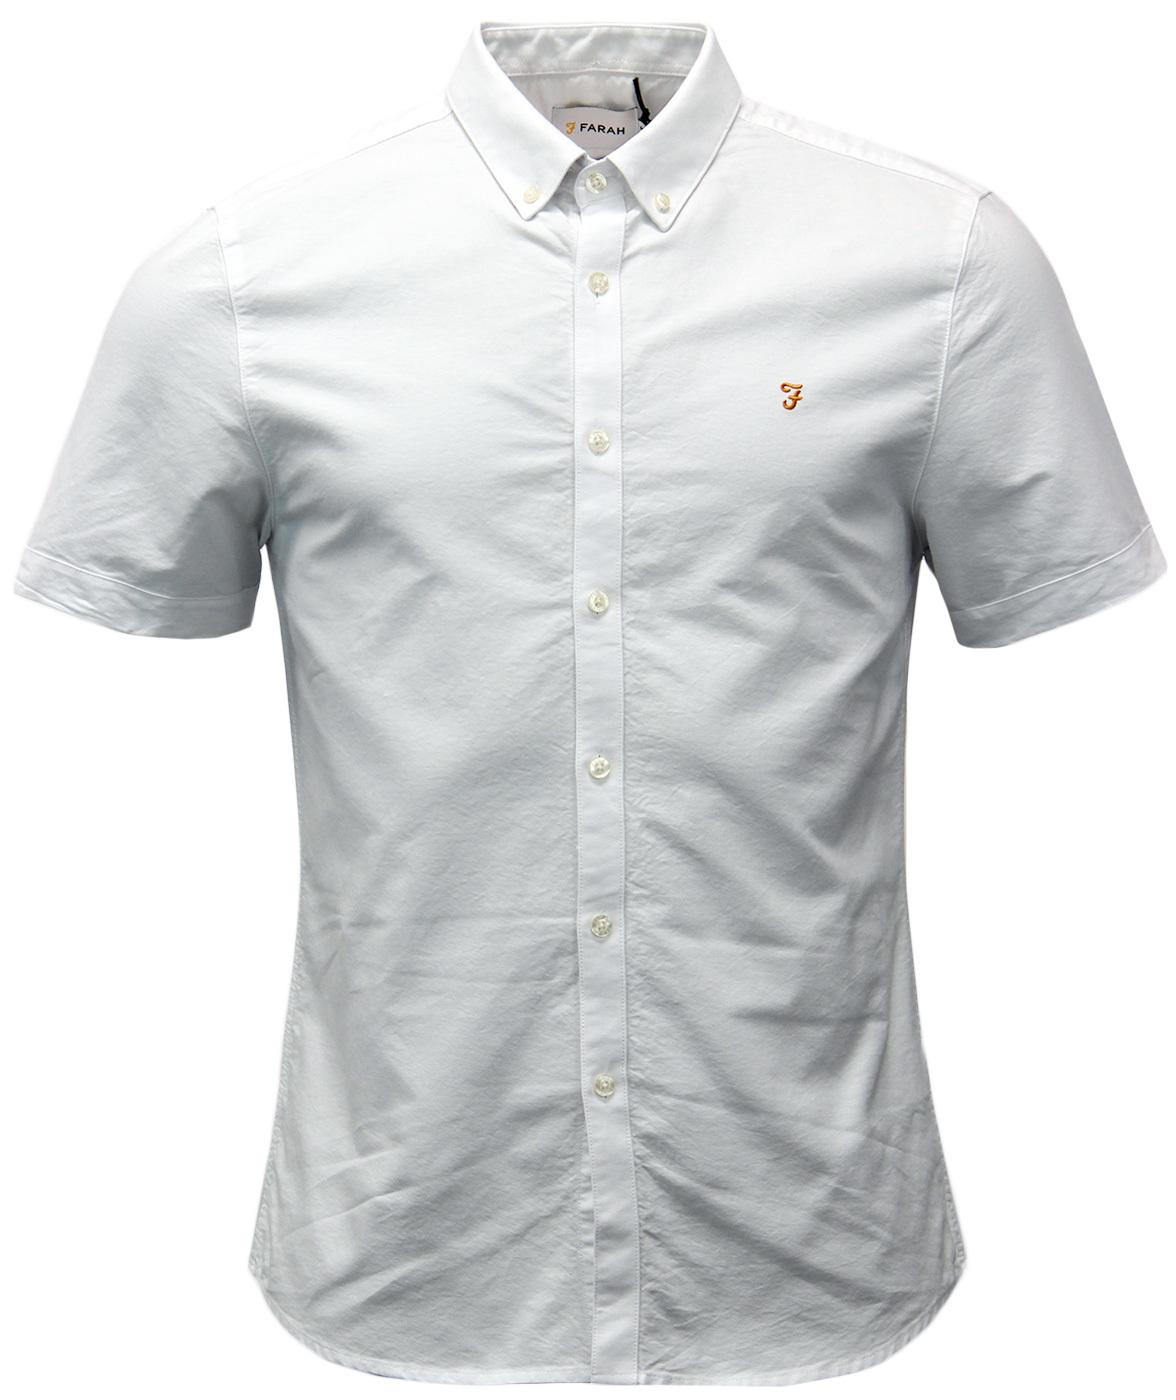 Brewer FARAH Retro 60s Short Sleeve Oxford Shirt